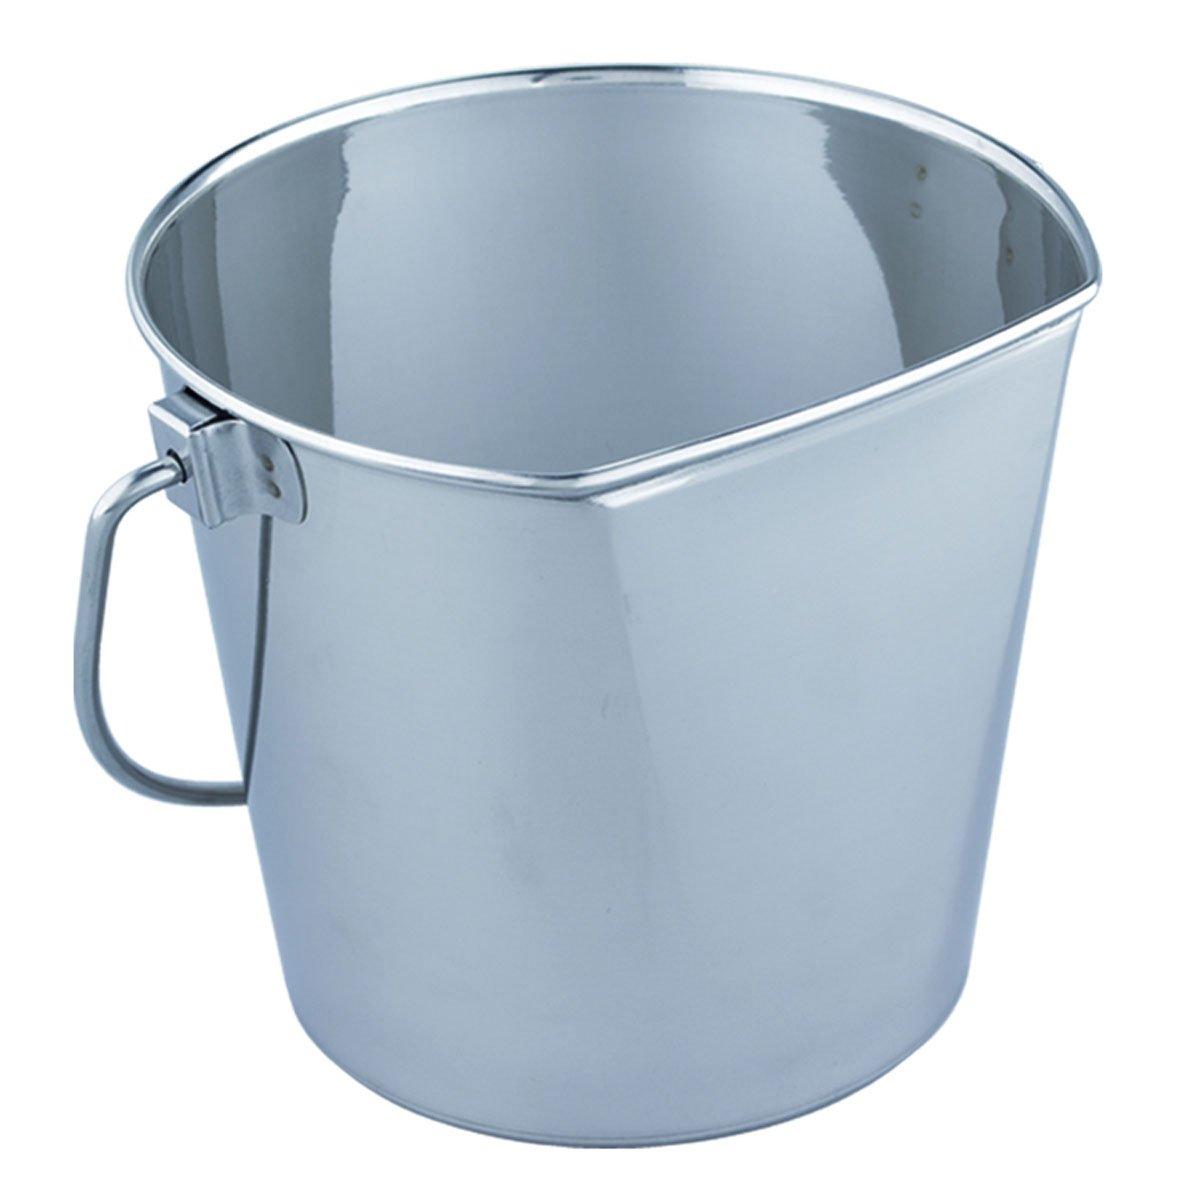 QT Dog Flat Sided Stainless Steel Bucket, 6 quart